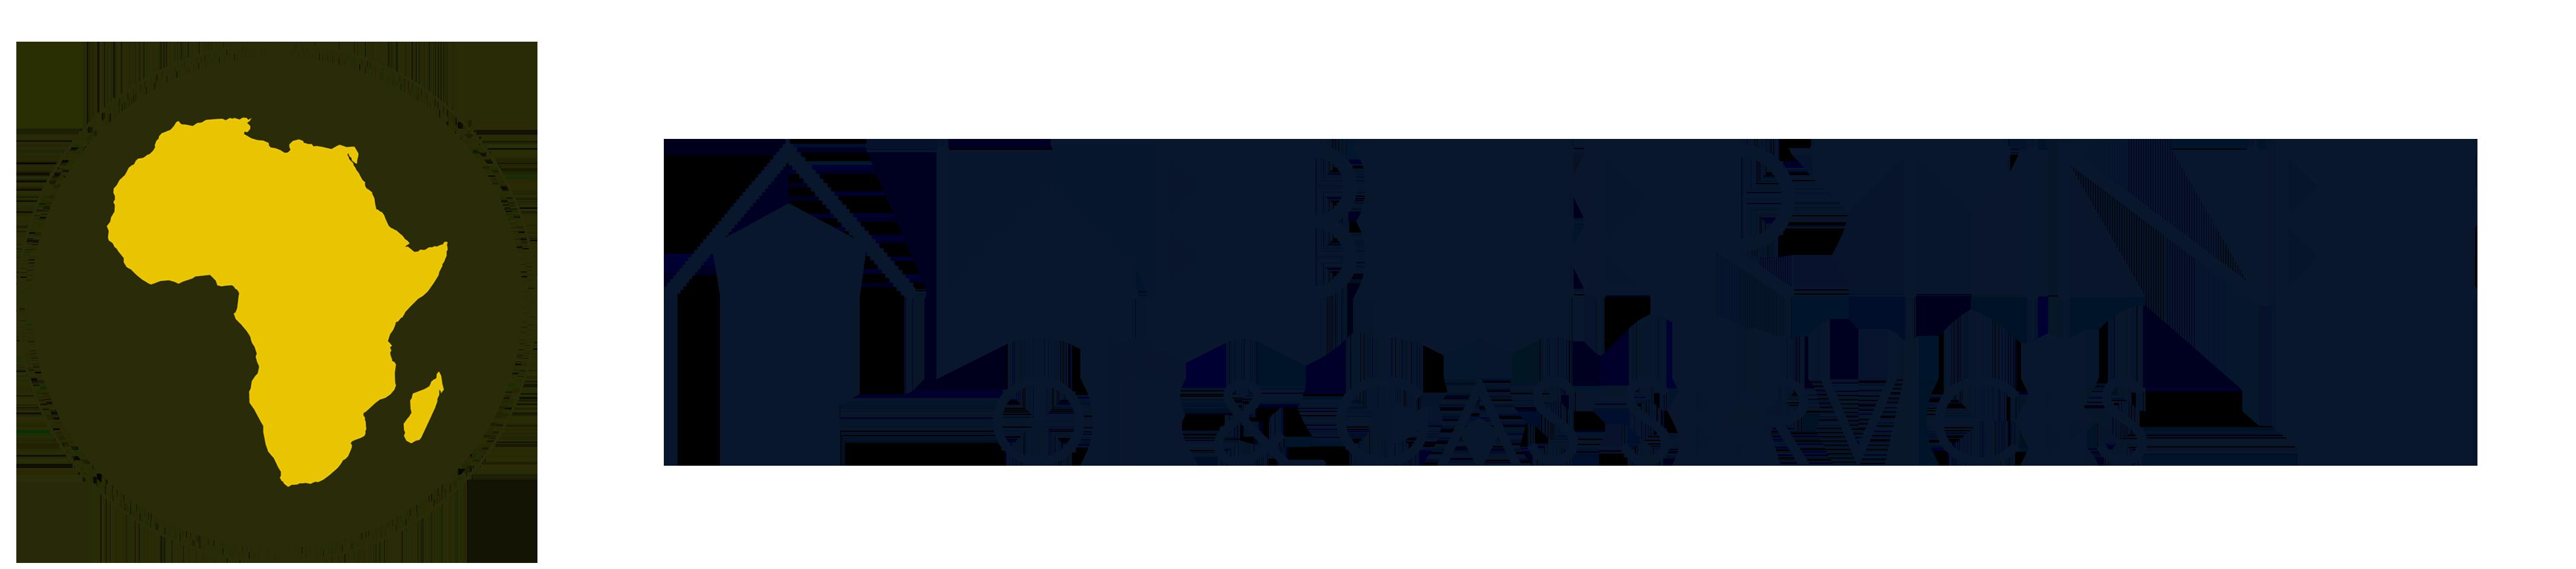 ALBERTINE OIL AND GAS SERVICES LTD.